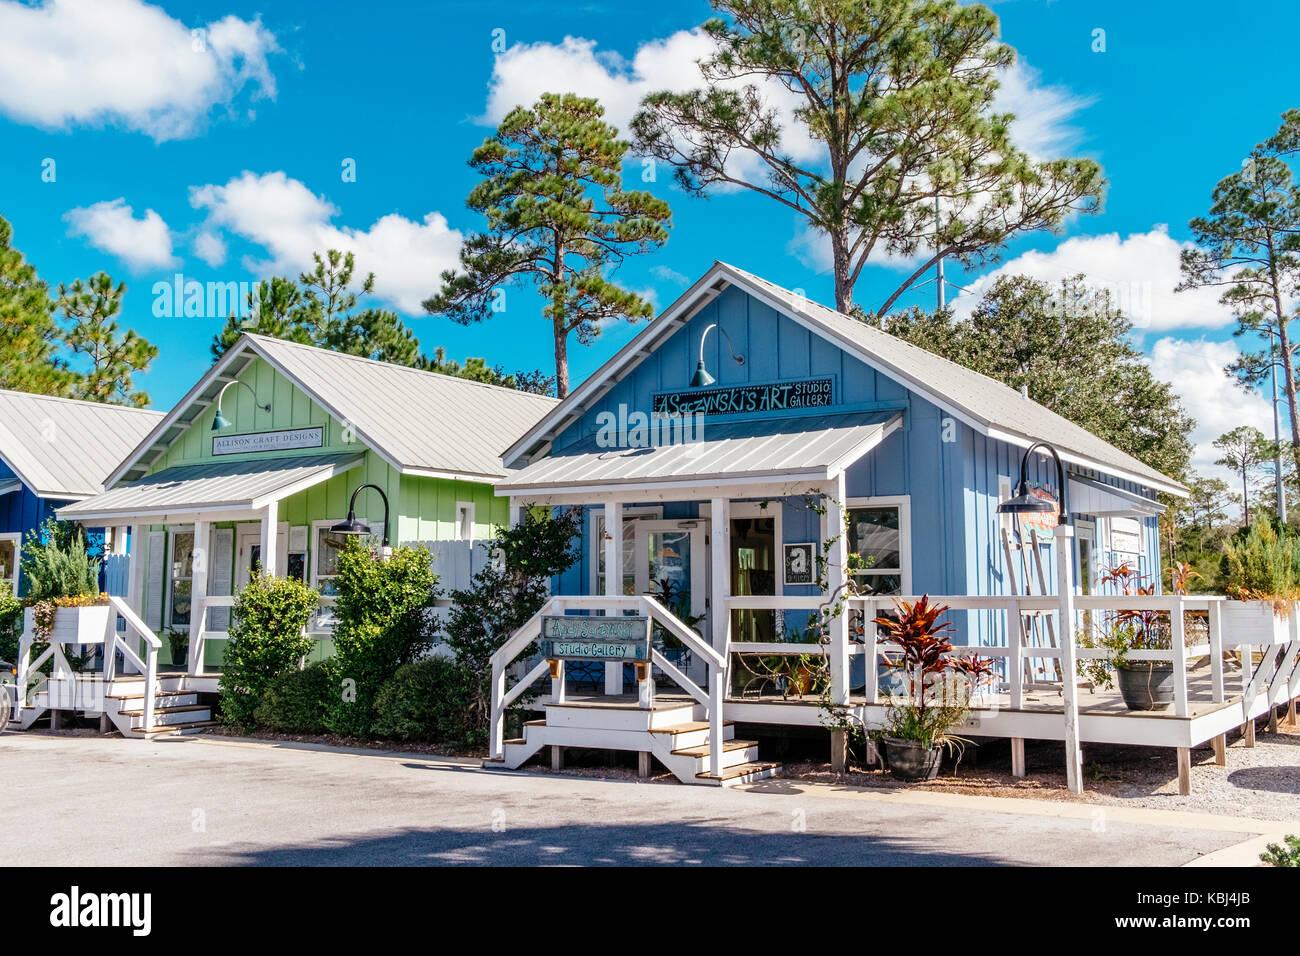 Small colorful shops near Grayton Beach a popular tourist destination on the Florida, USA, Gulf of Mexico, panhandleStock Photo